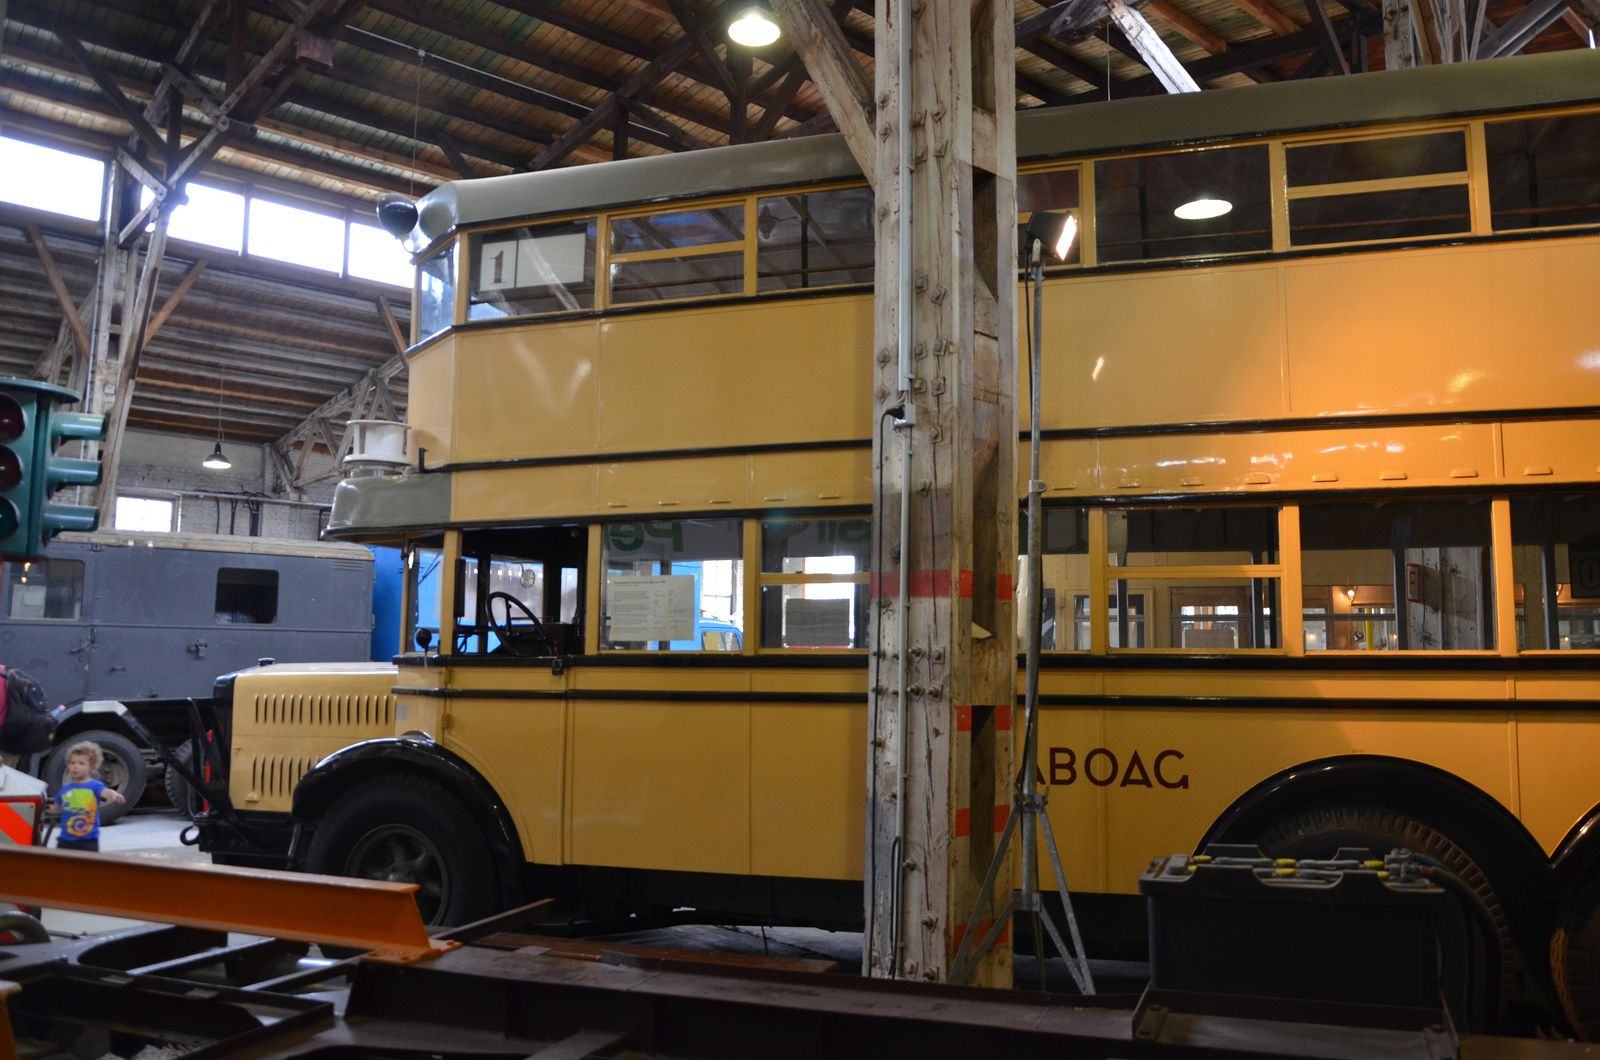 historische busse dtm depot transports urbains et fer oeffentliche verkehrsmittel u. Black Bedroom Furniture Sets. Home Design Ideas